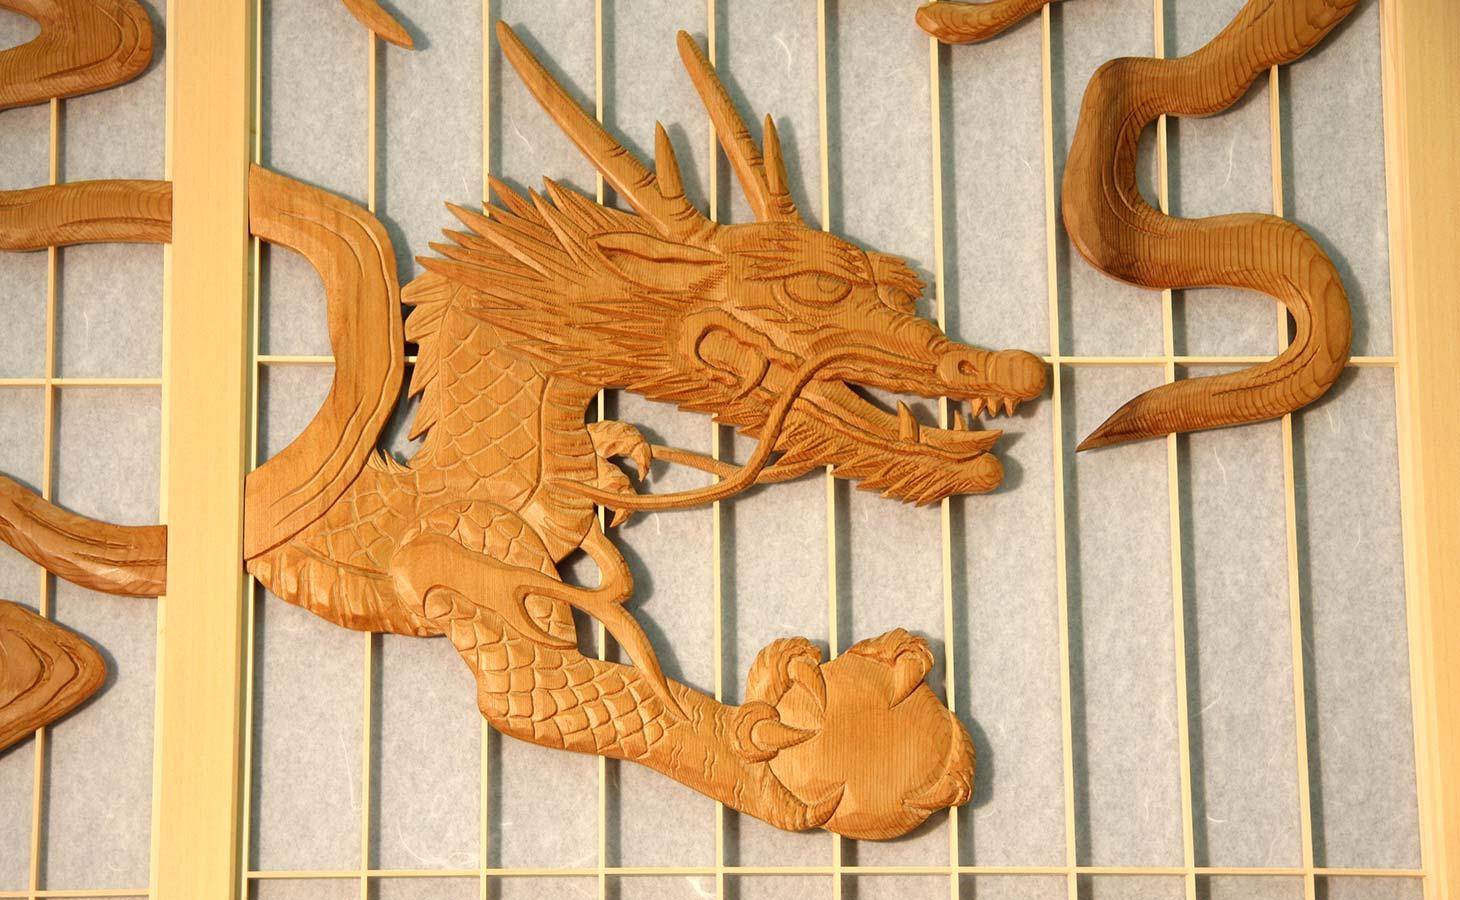 龍虎彫刻入飾り障子-龍-